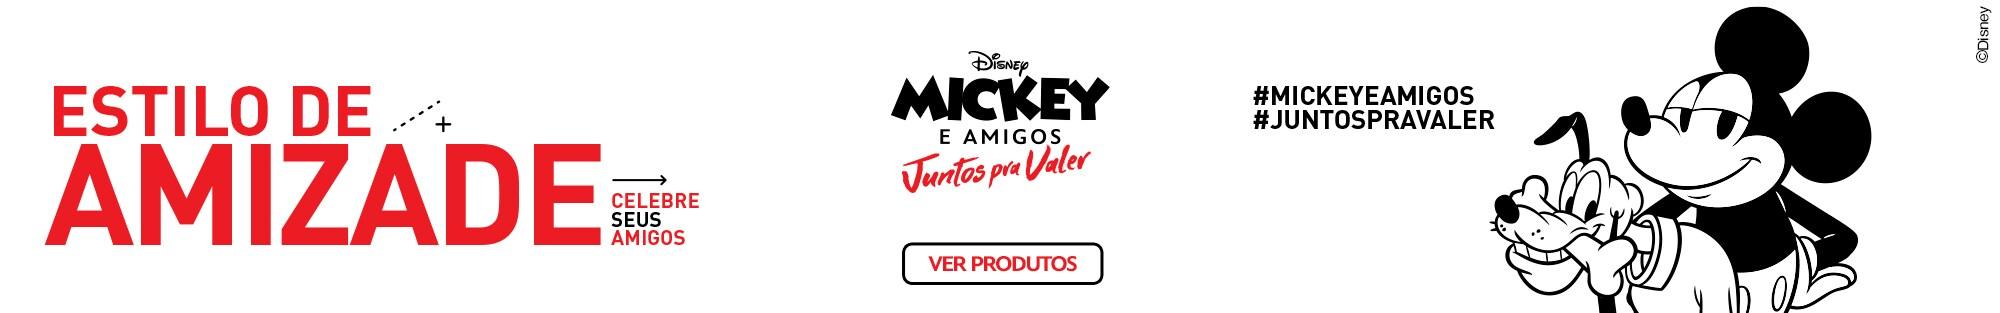 Mid_ShopDisney_Disney_Jul20_(Ext)